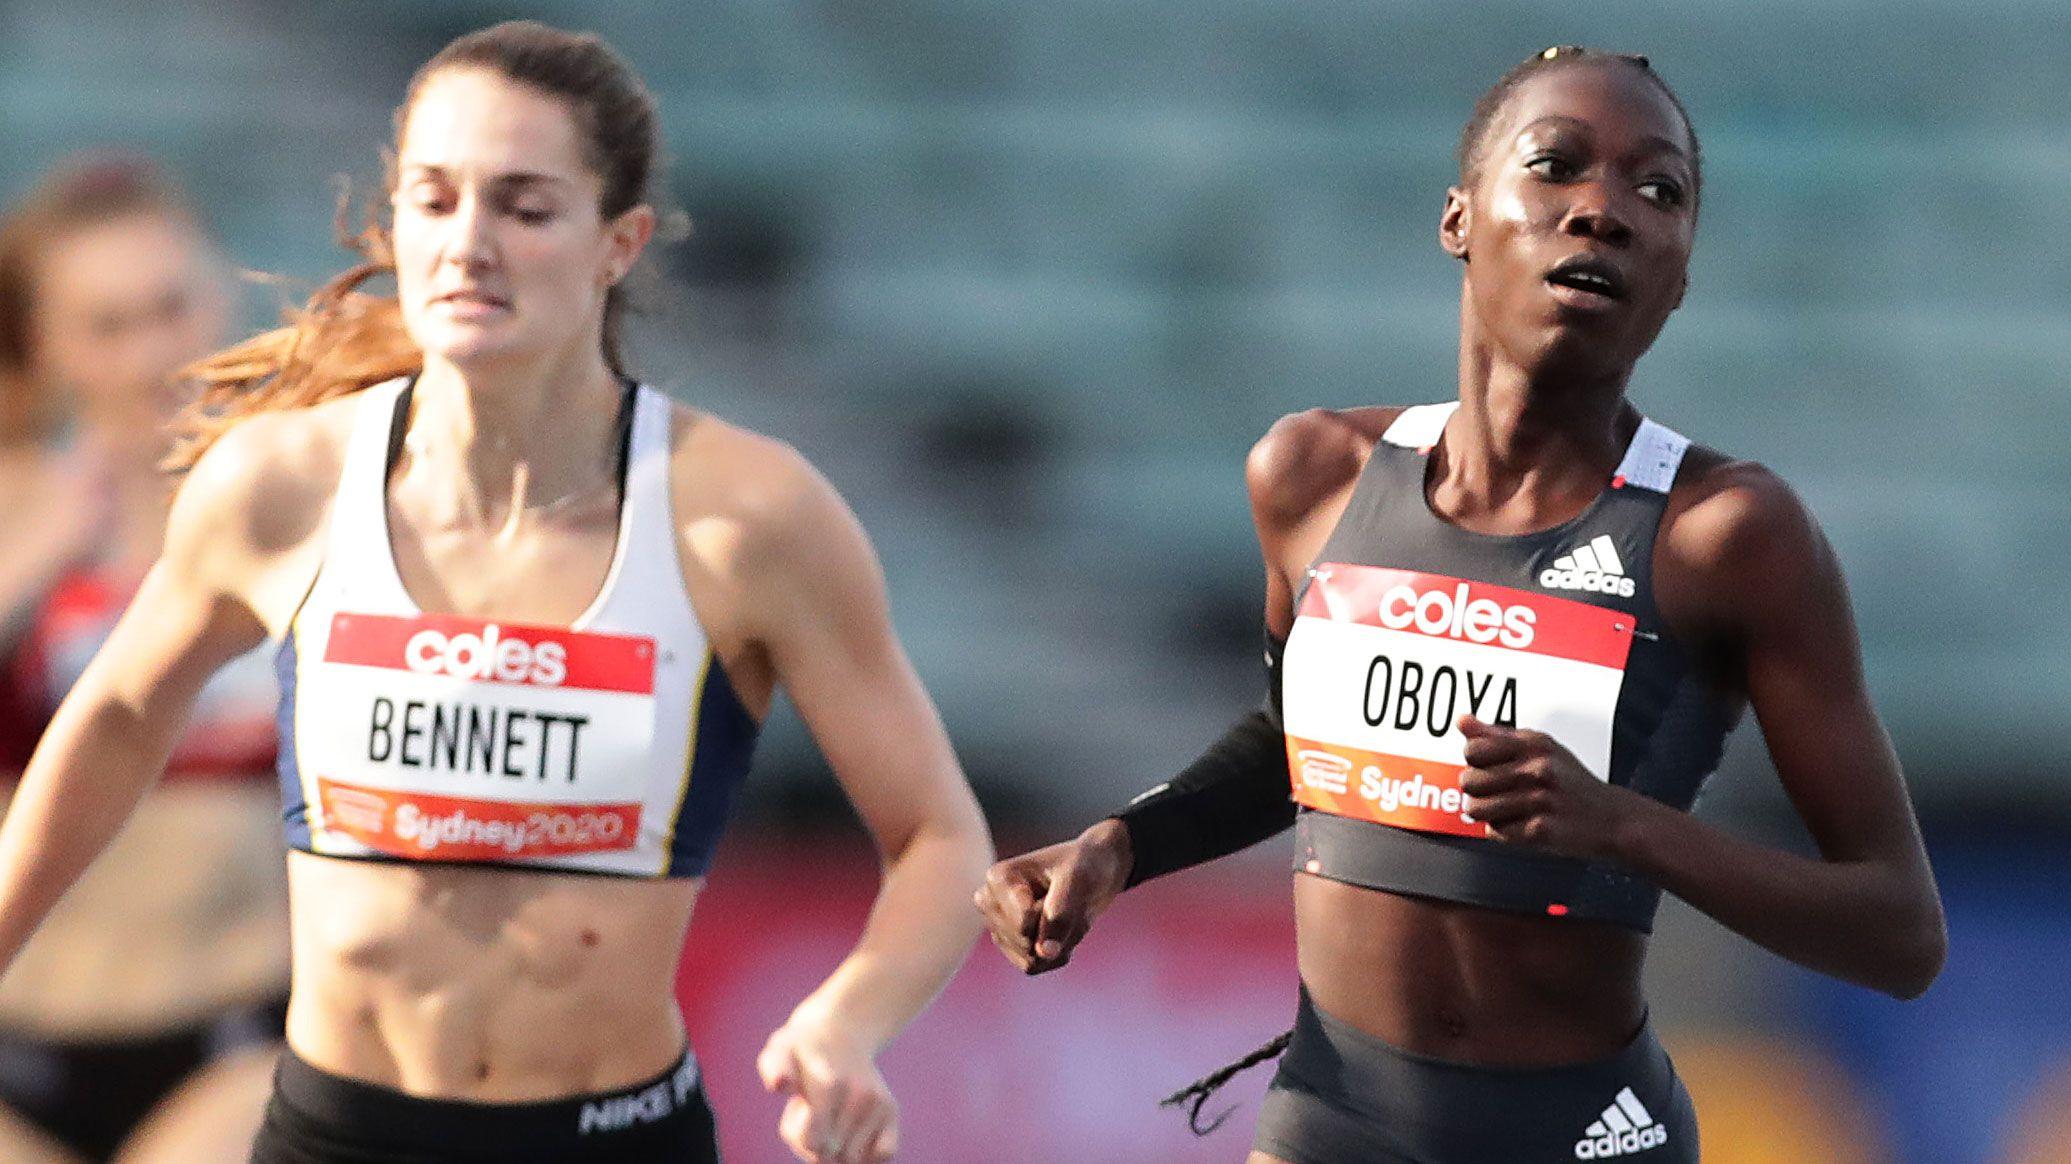 Bendere Oboya wins ahead of Rebecca Bennett.